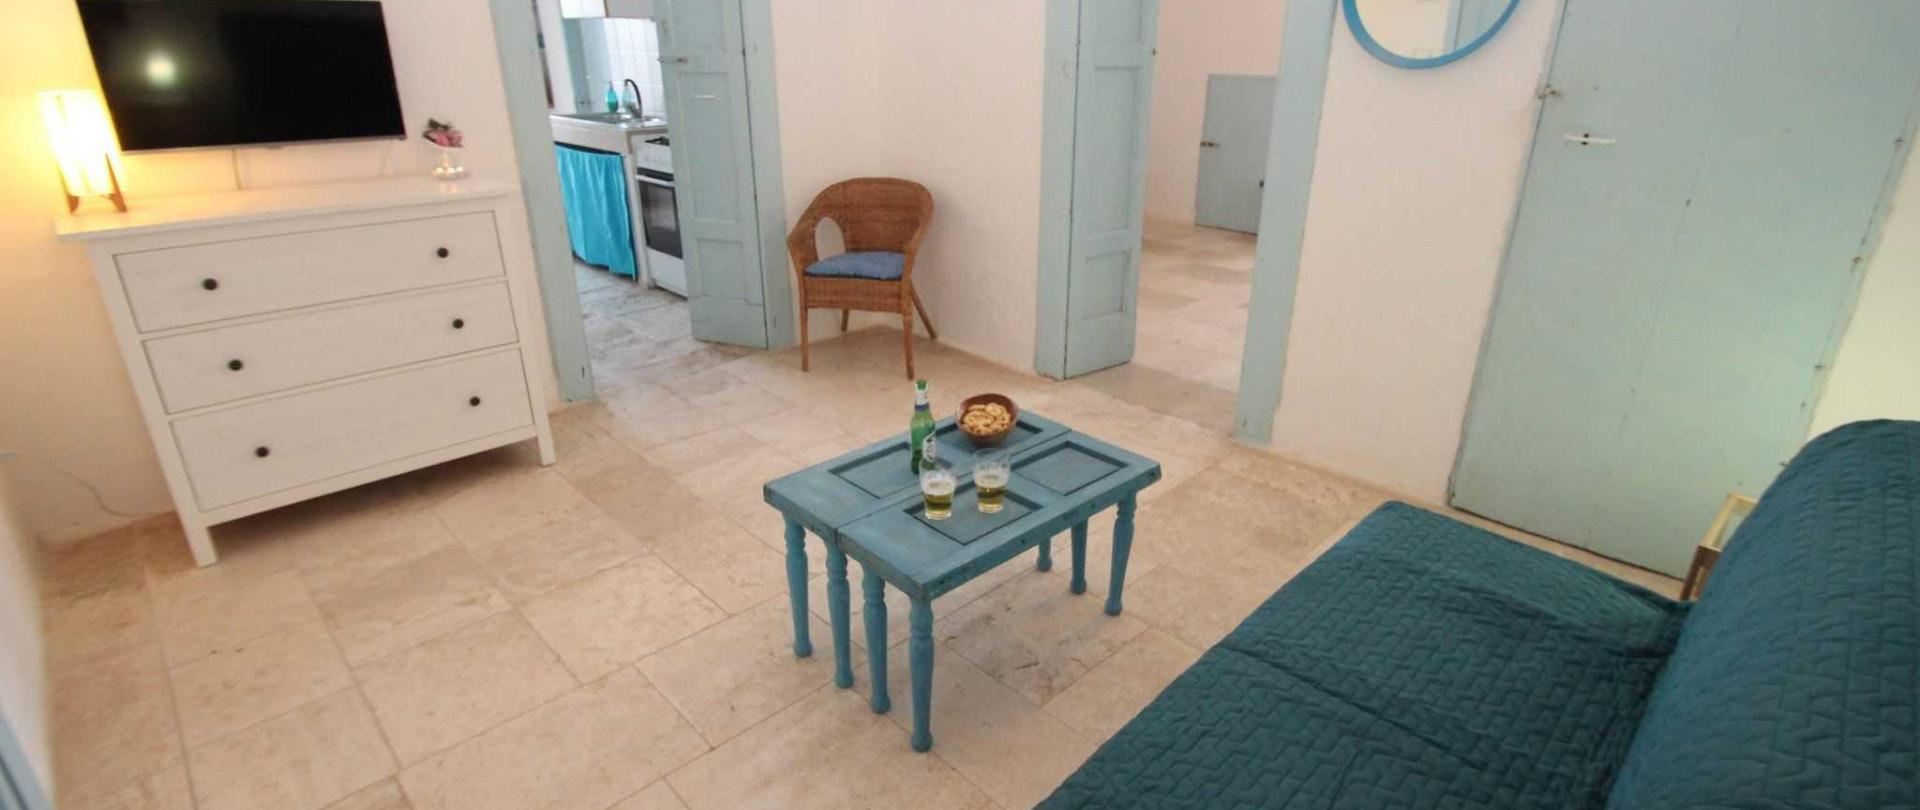 masseria-pugliese-apt-aria-lounge-1.JPG